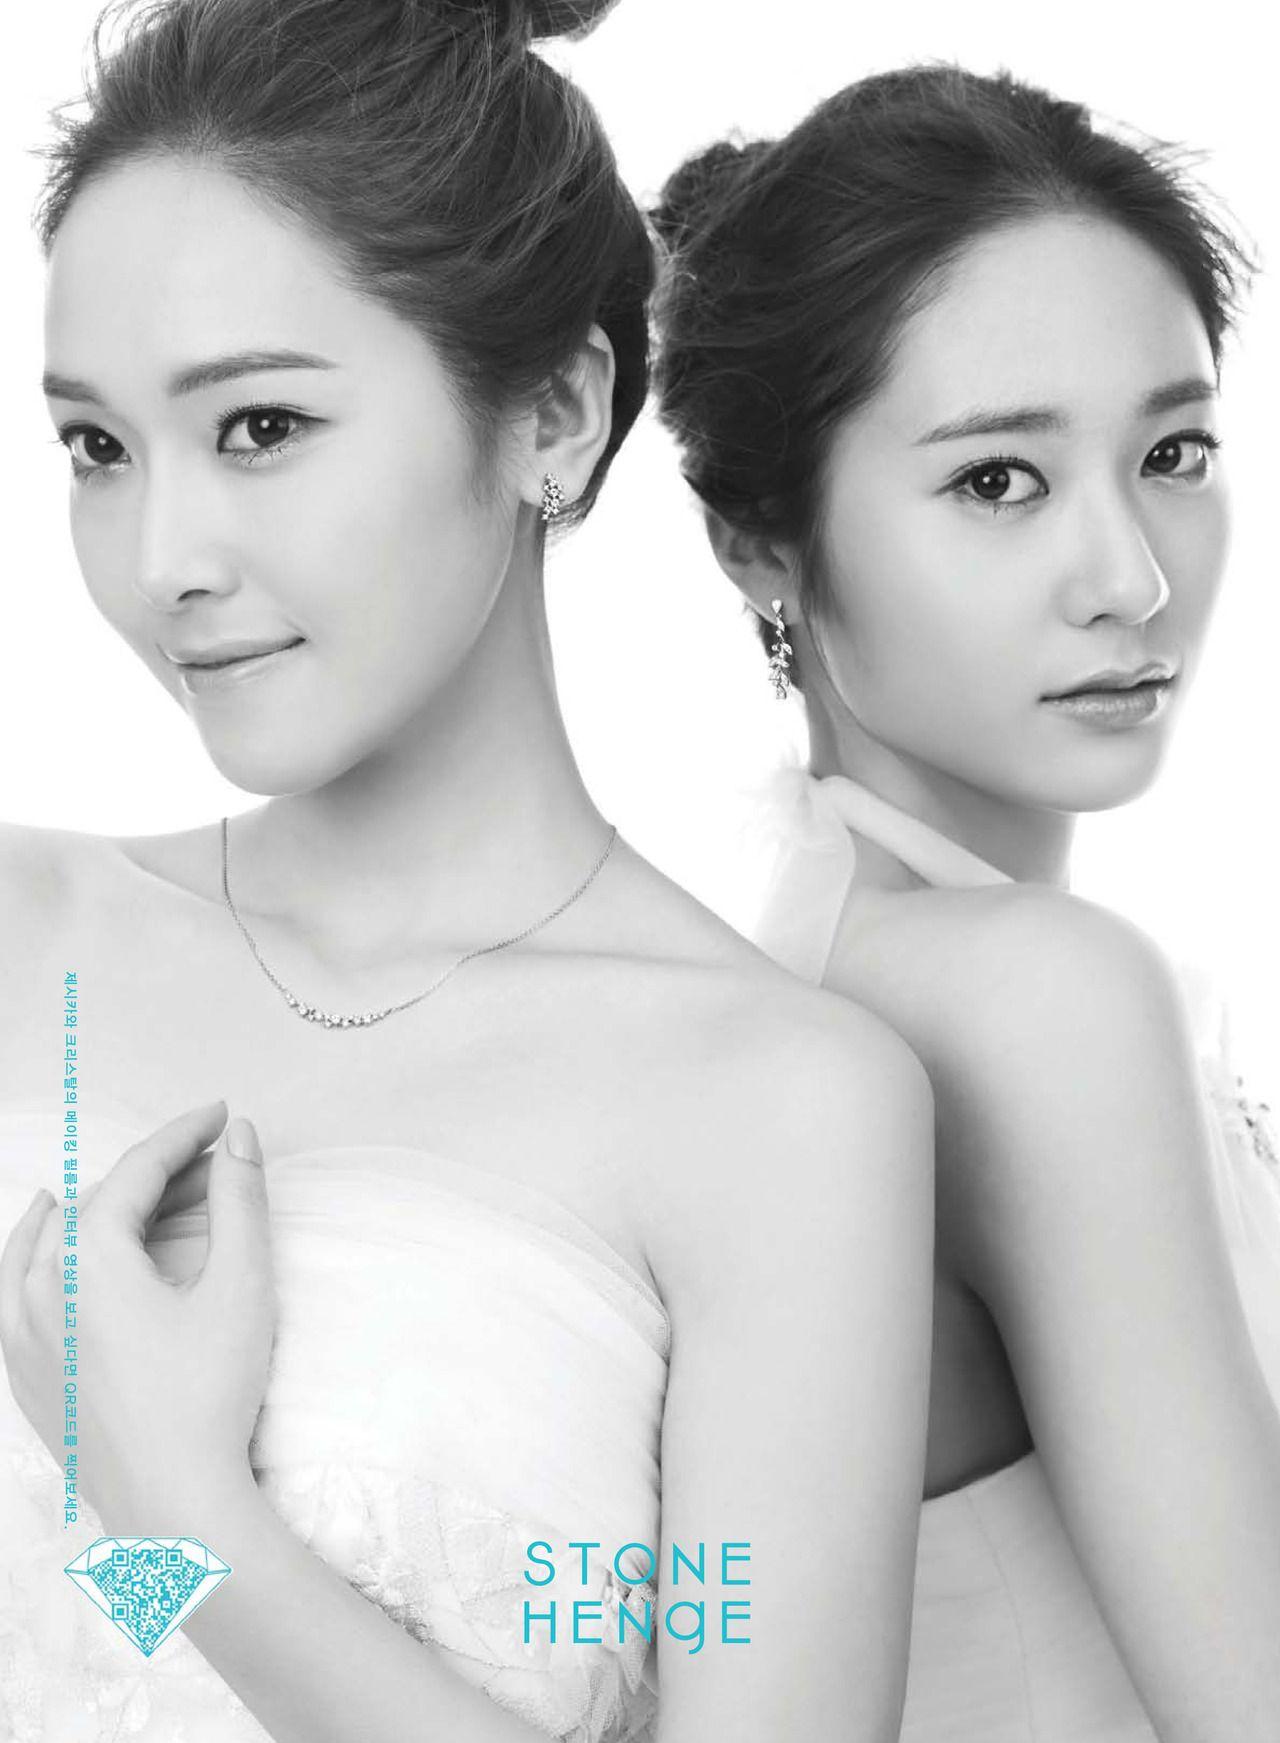 SNSD Jessica and f(x) Krystal - Stonehenge